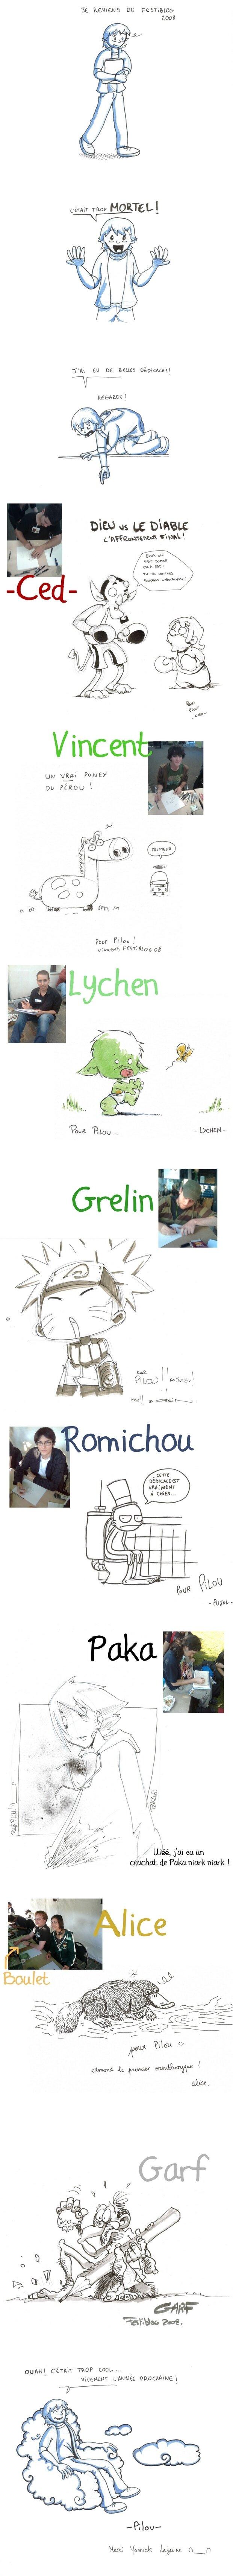 Festiblog 2008, dédicaces de Paka, Garf, Ced, Lychen, Garf, Grelin, vincent, Alice. Merci Yannick Lejeune !